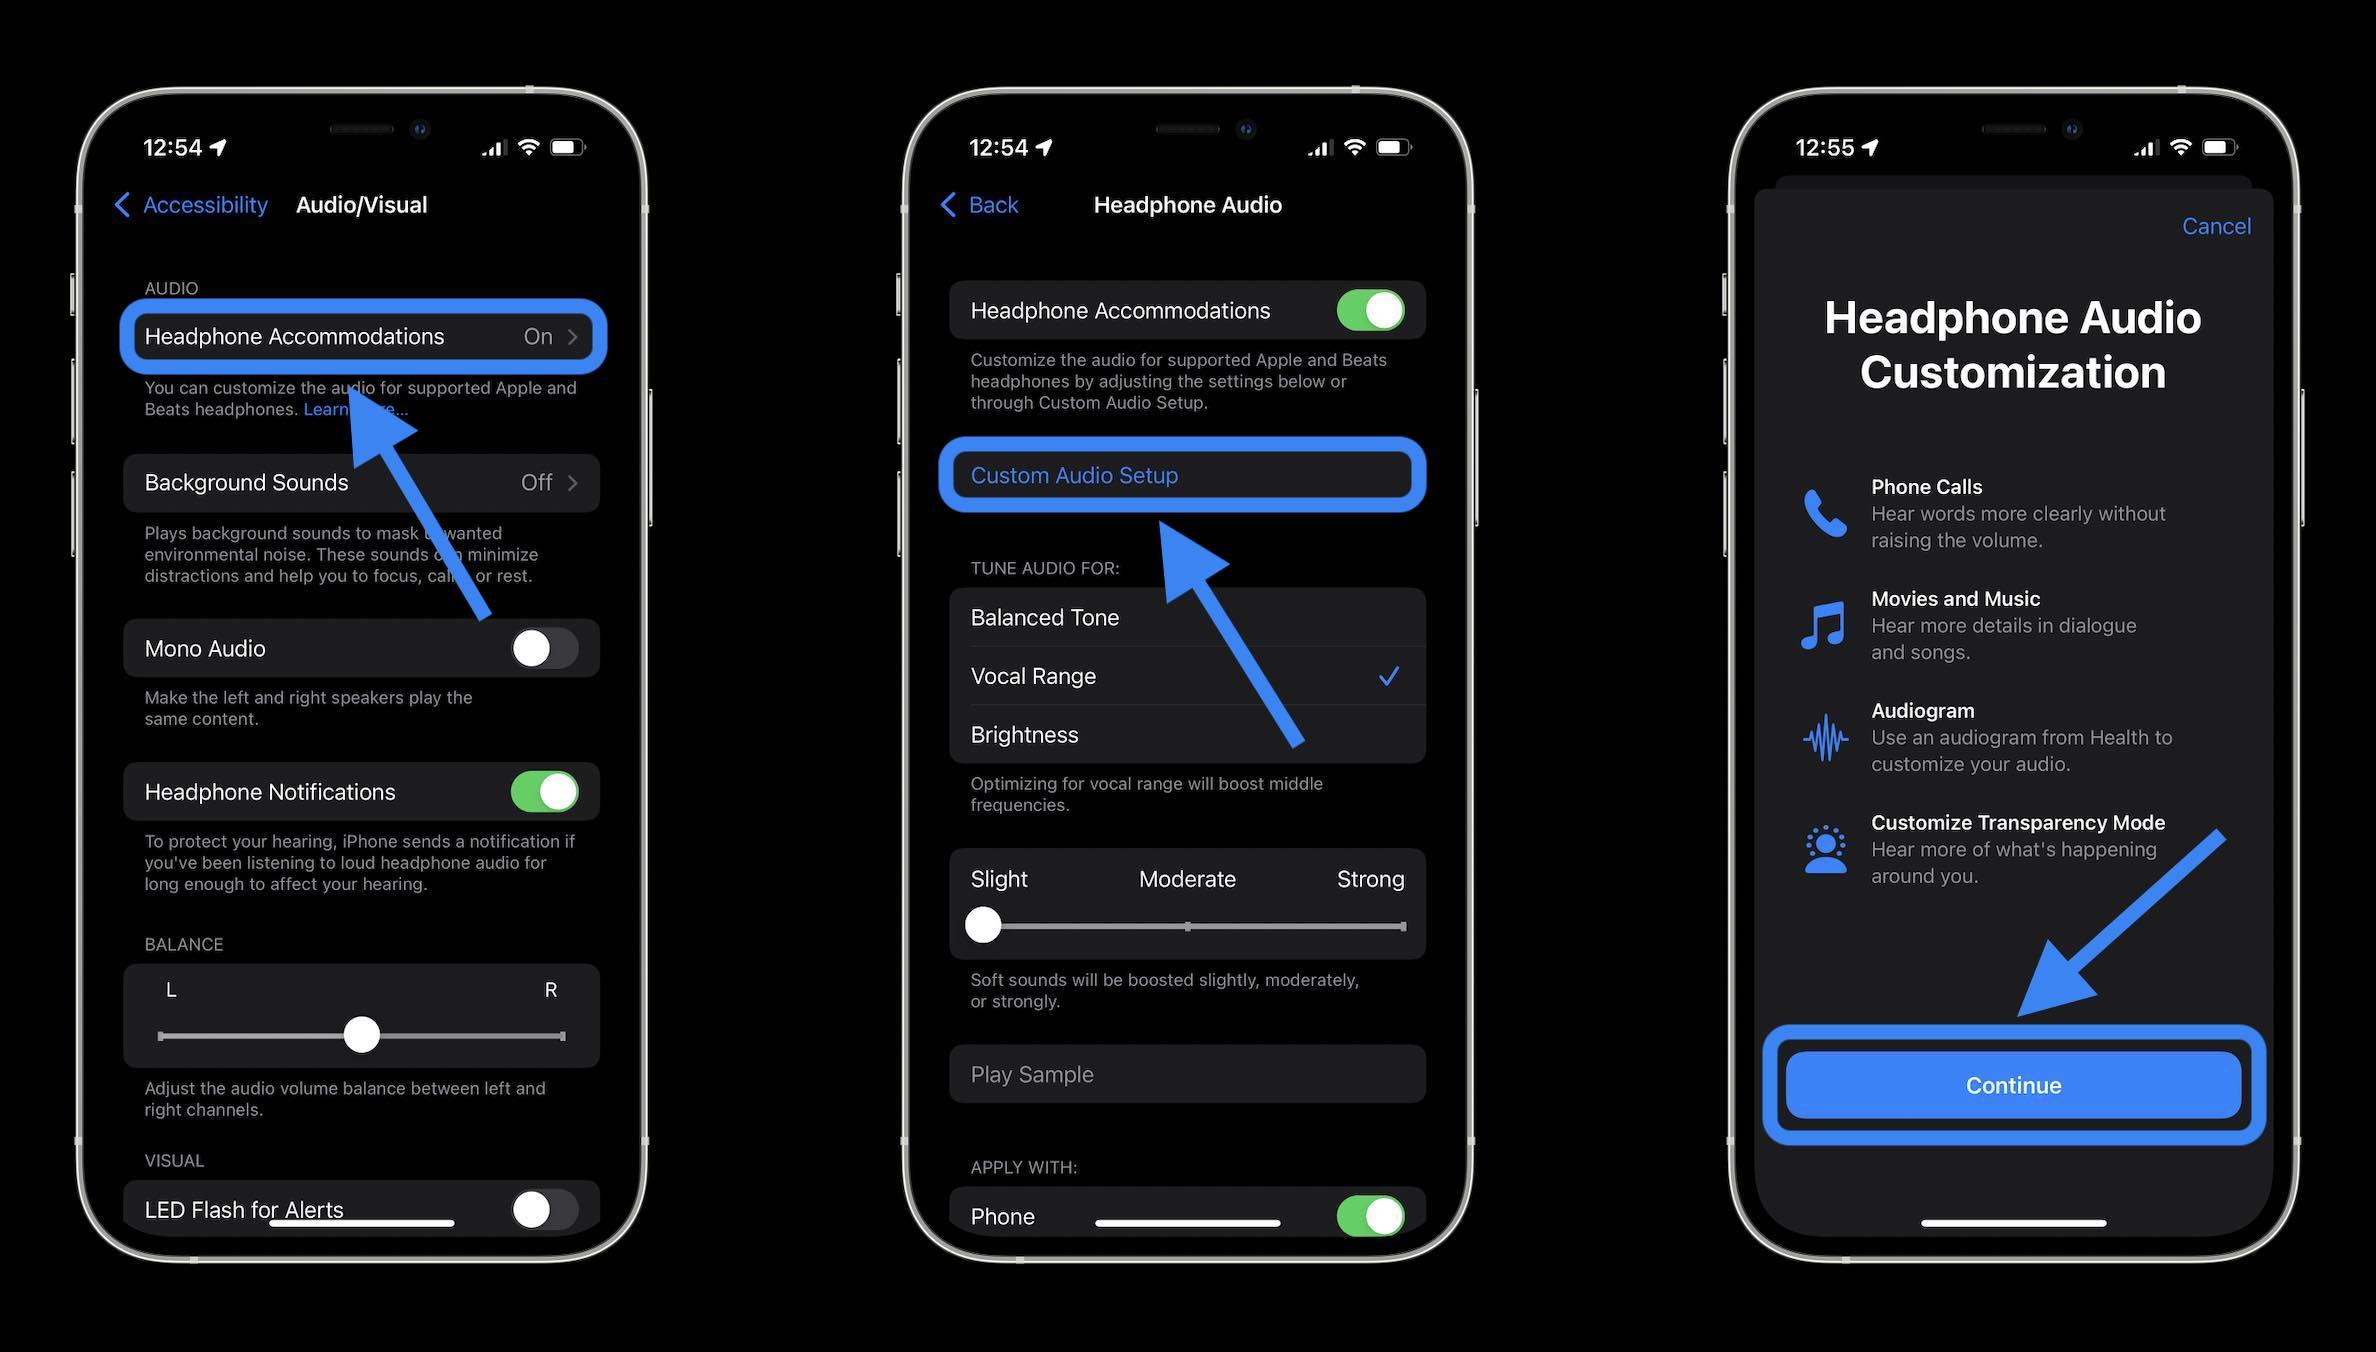 Turn on AirPods Pro Conversation Boost - Headphone Accomodations > Custom Audio Setup